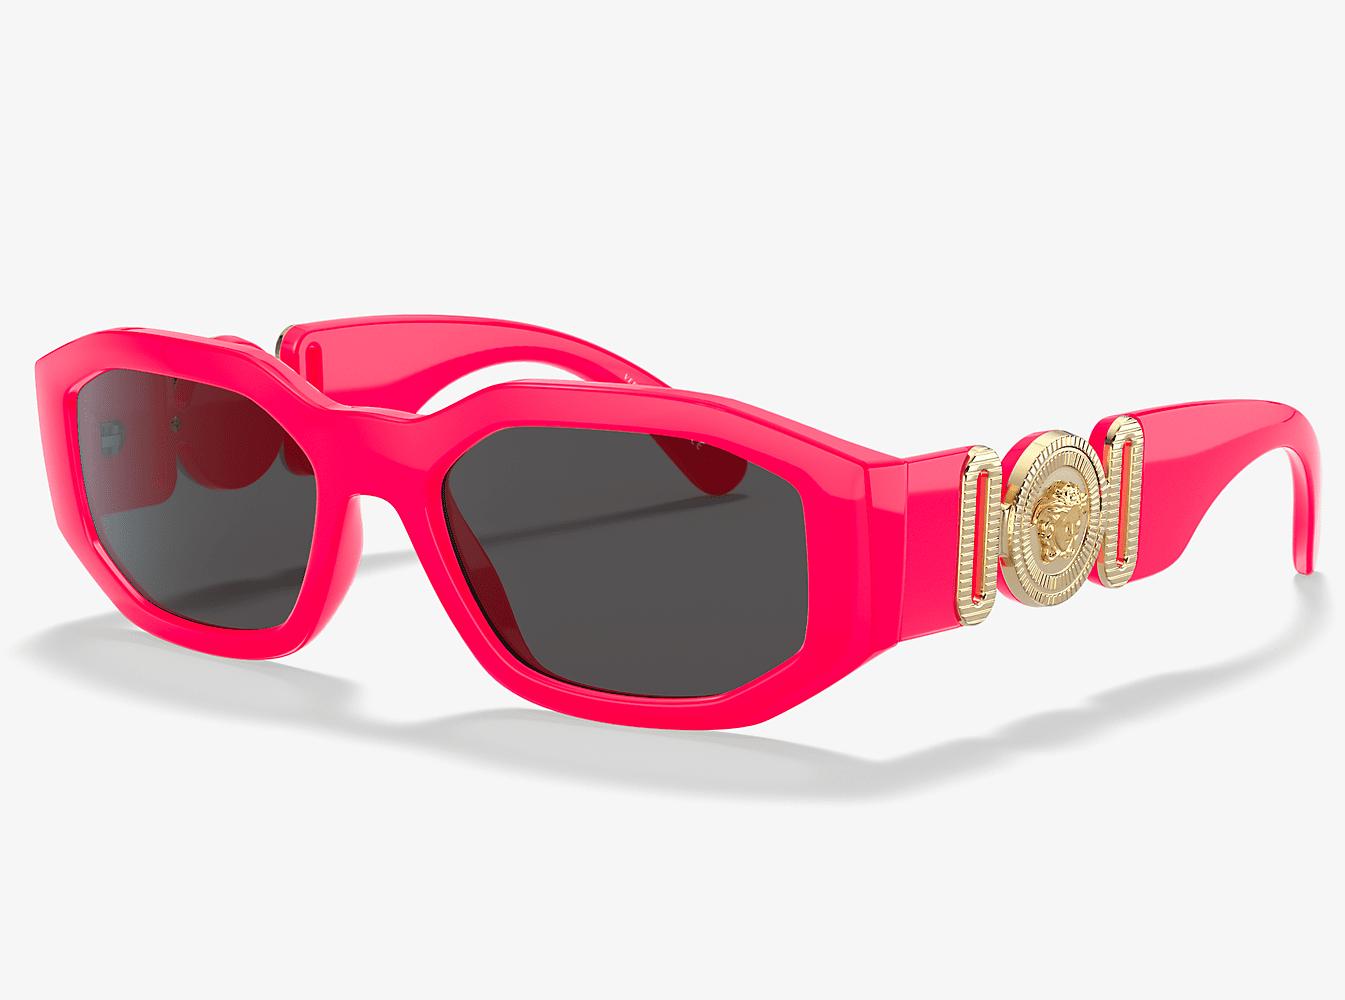 Sunglass Hut: 30% Off Designer Sunglasses